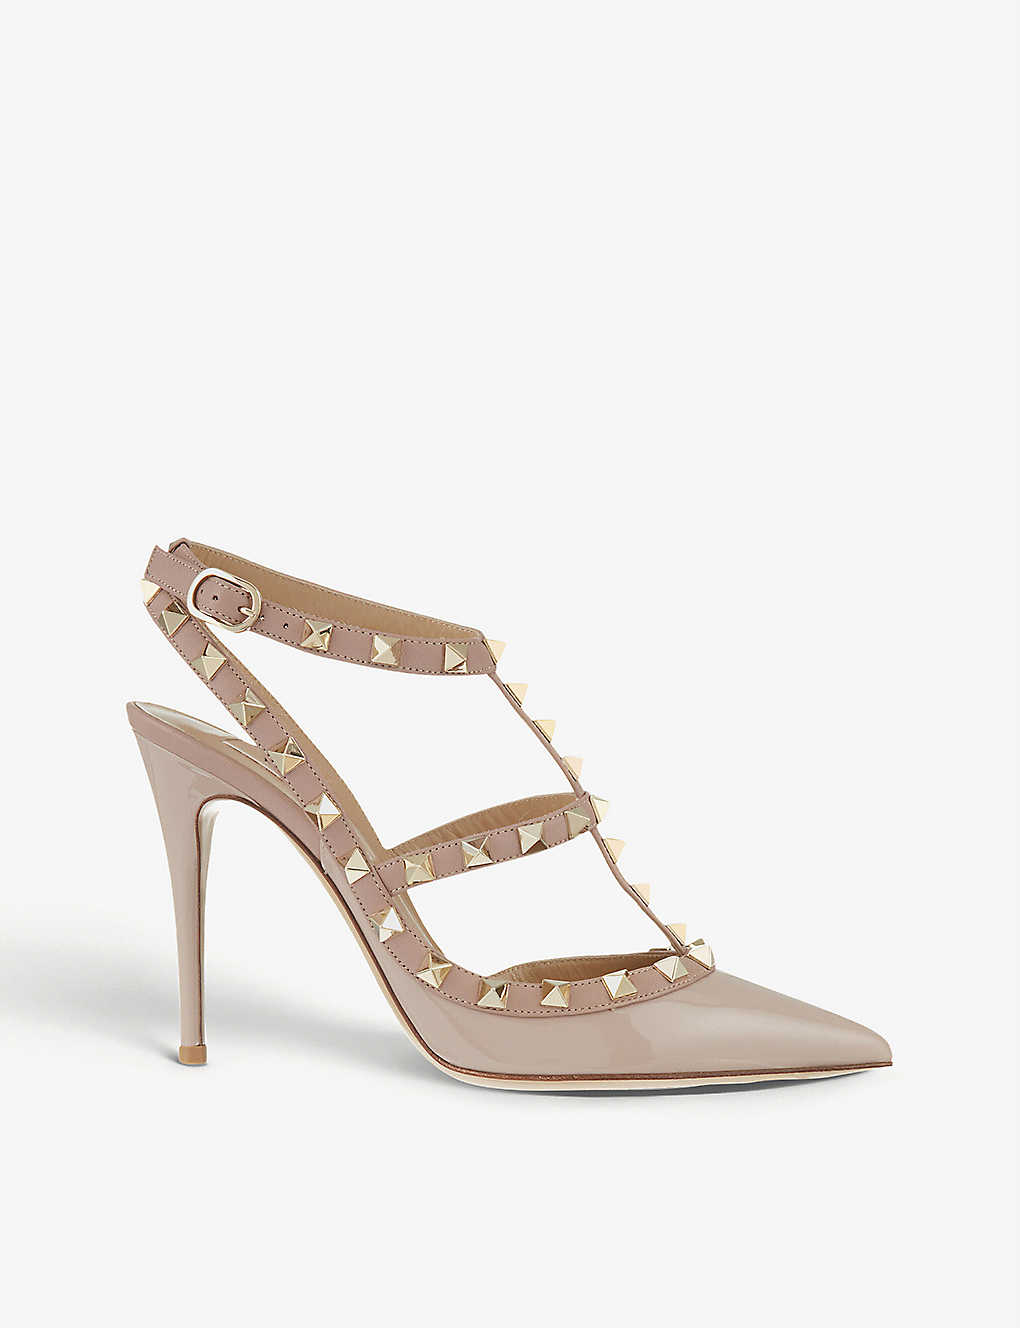 71a54e42058b VALENTINO - Rockstud patent leather heels